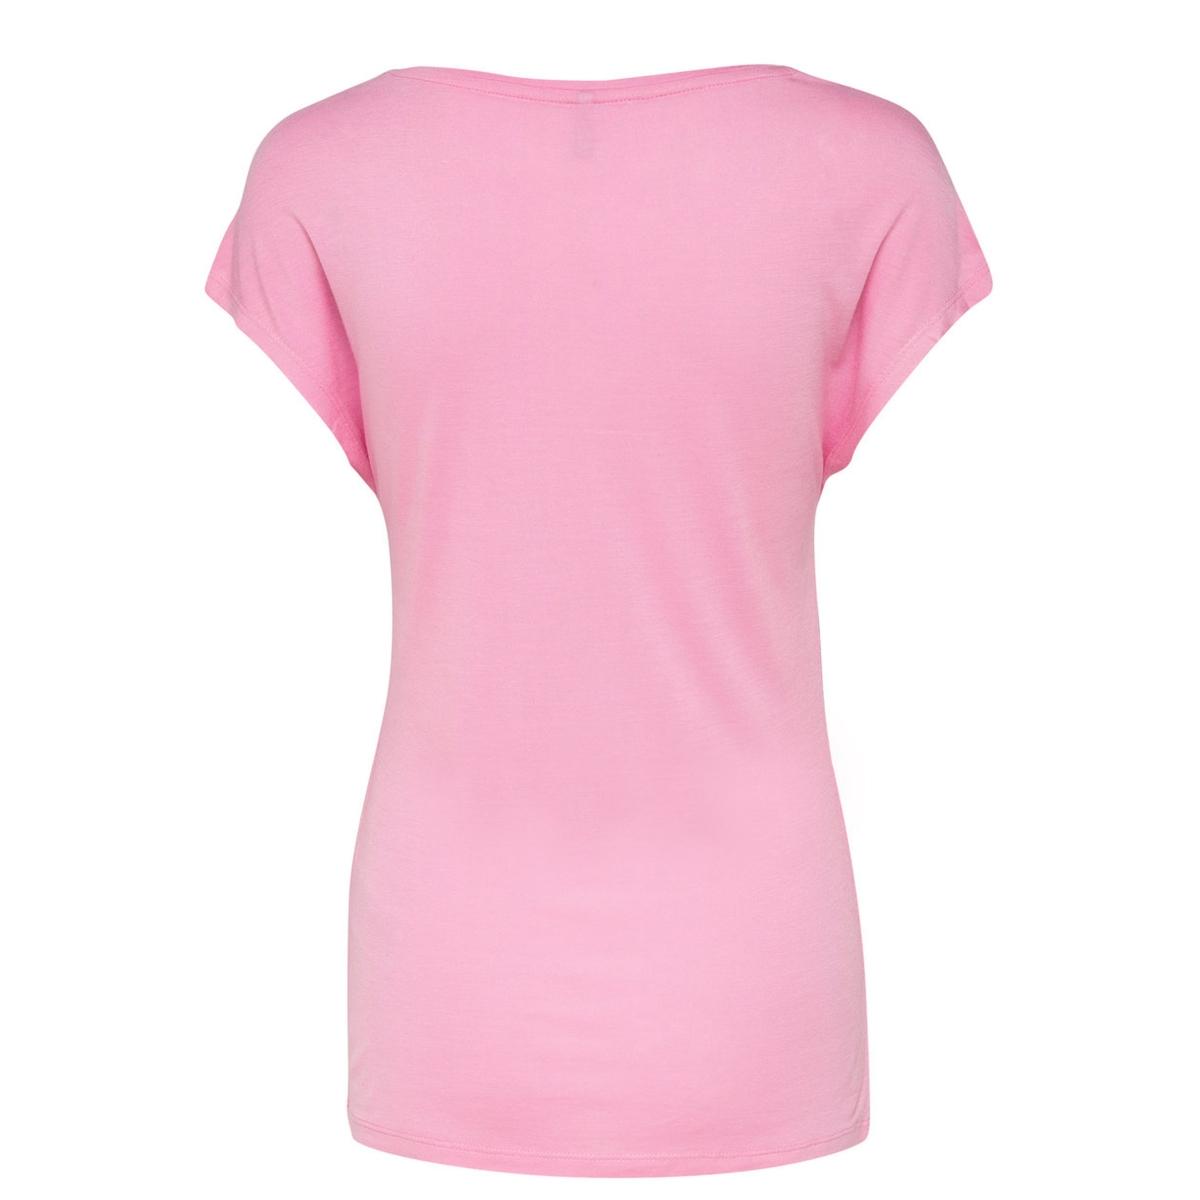 onlviscose s/s fav print top box es 15149797 only t-shirt prism pink/show